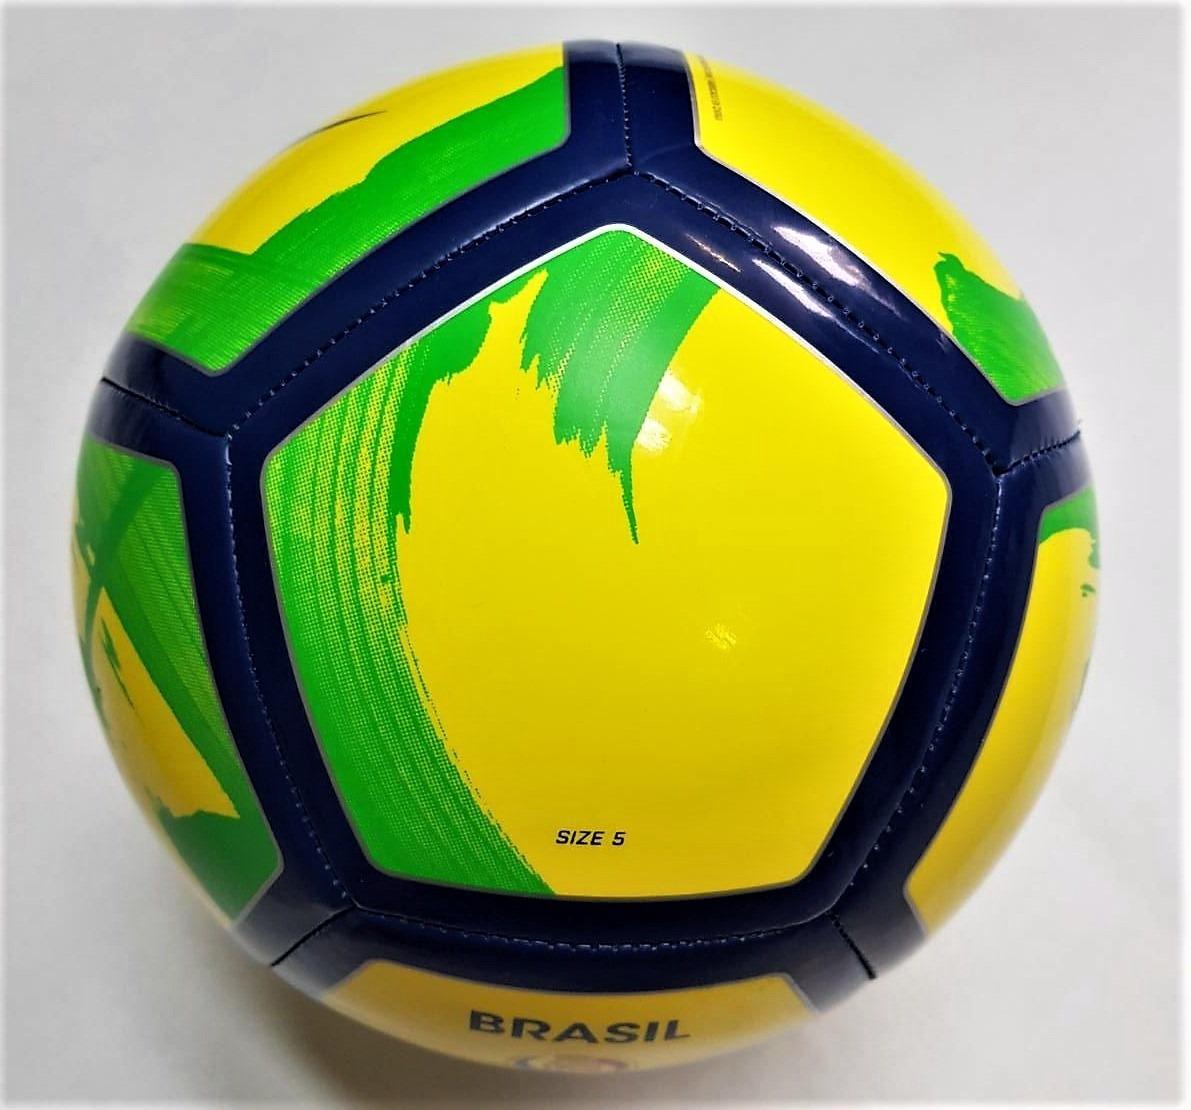 Balon Futbol Nike Copa America Centenario Brasil No.5 -   379.00 en ... 6674adb2f8ee8